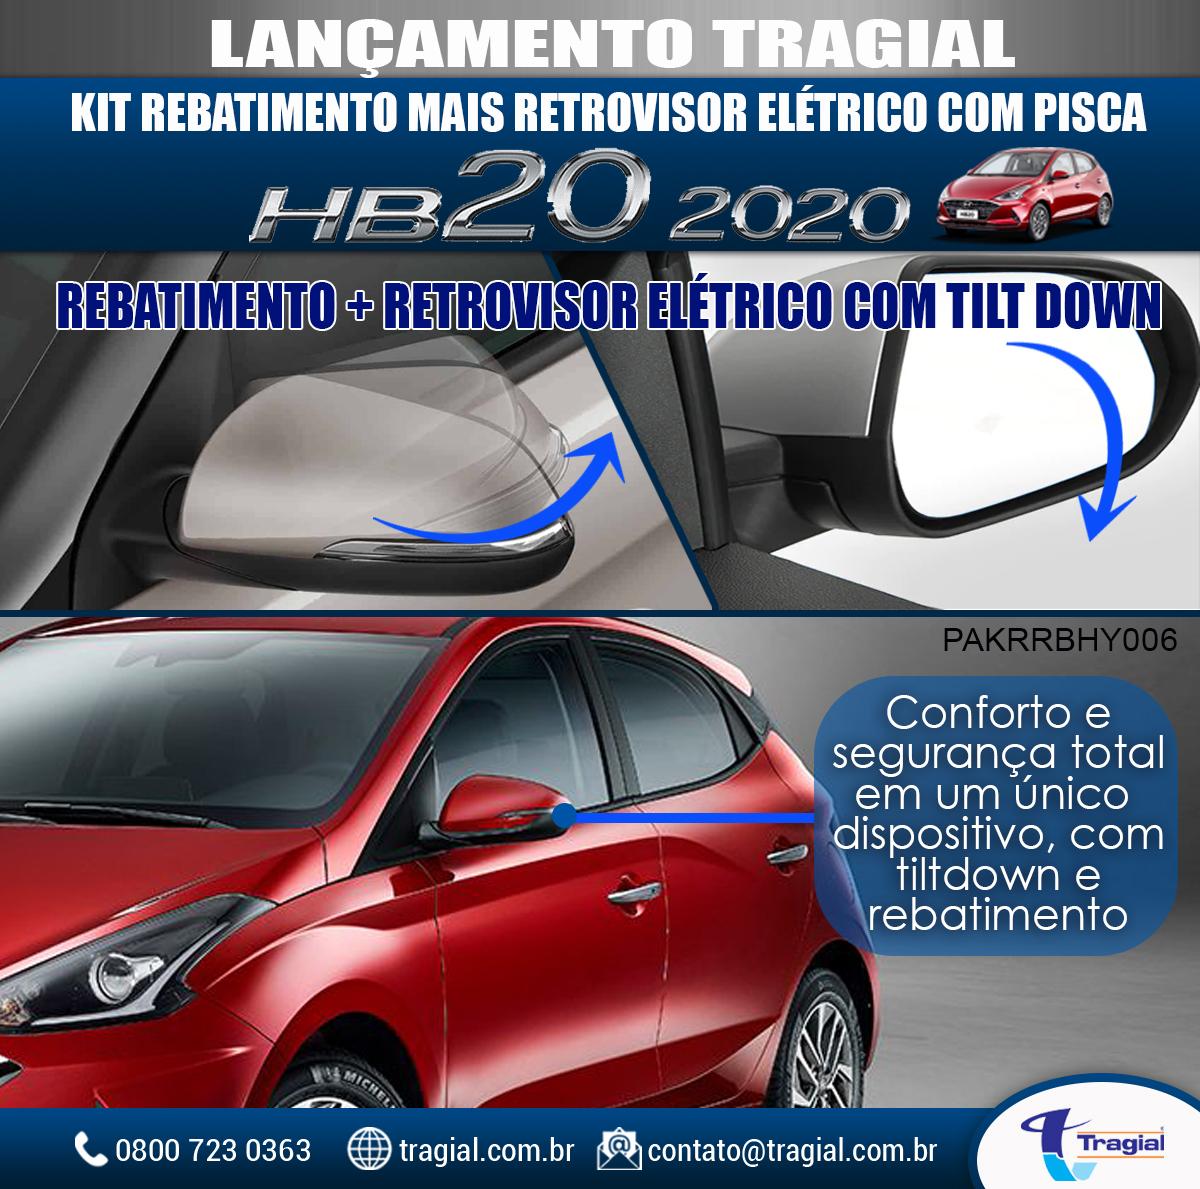 Kit Retrovisor Rebatimento + Tilt Down Hyundai Hb20 2020 Tragial